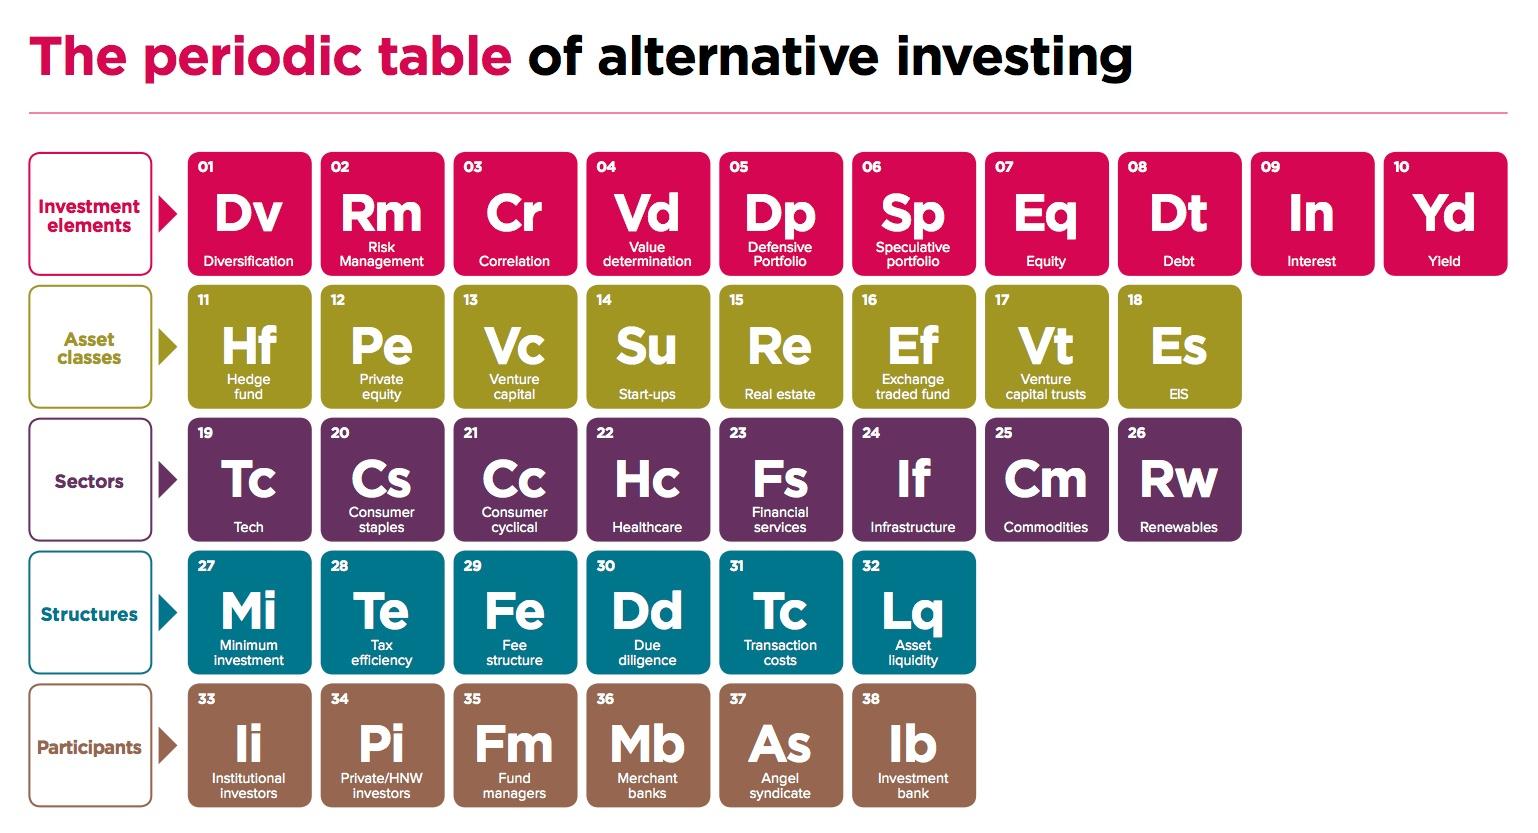 Periodic Table of Alternative Investing